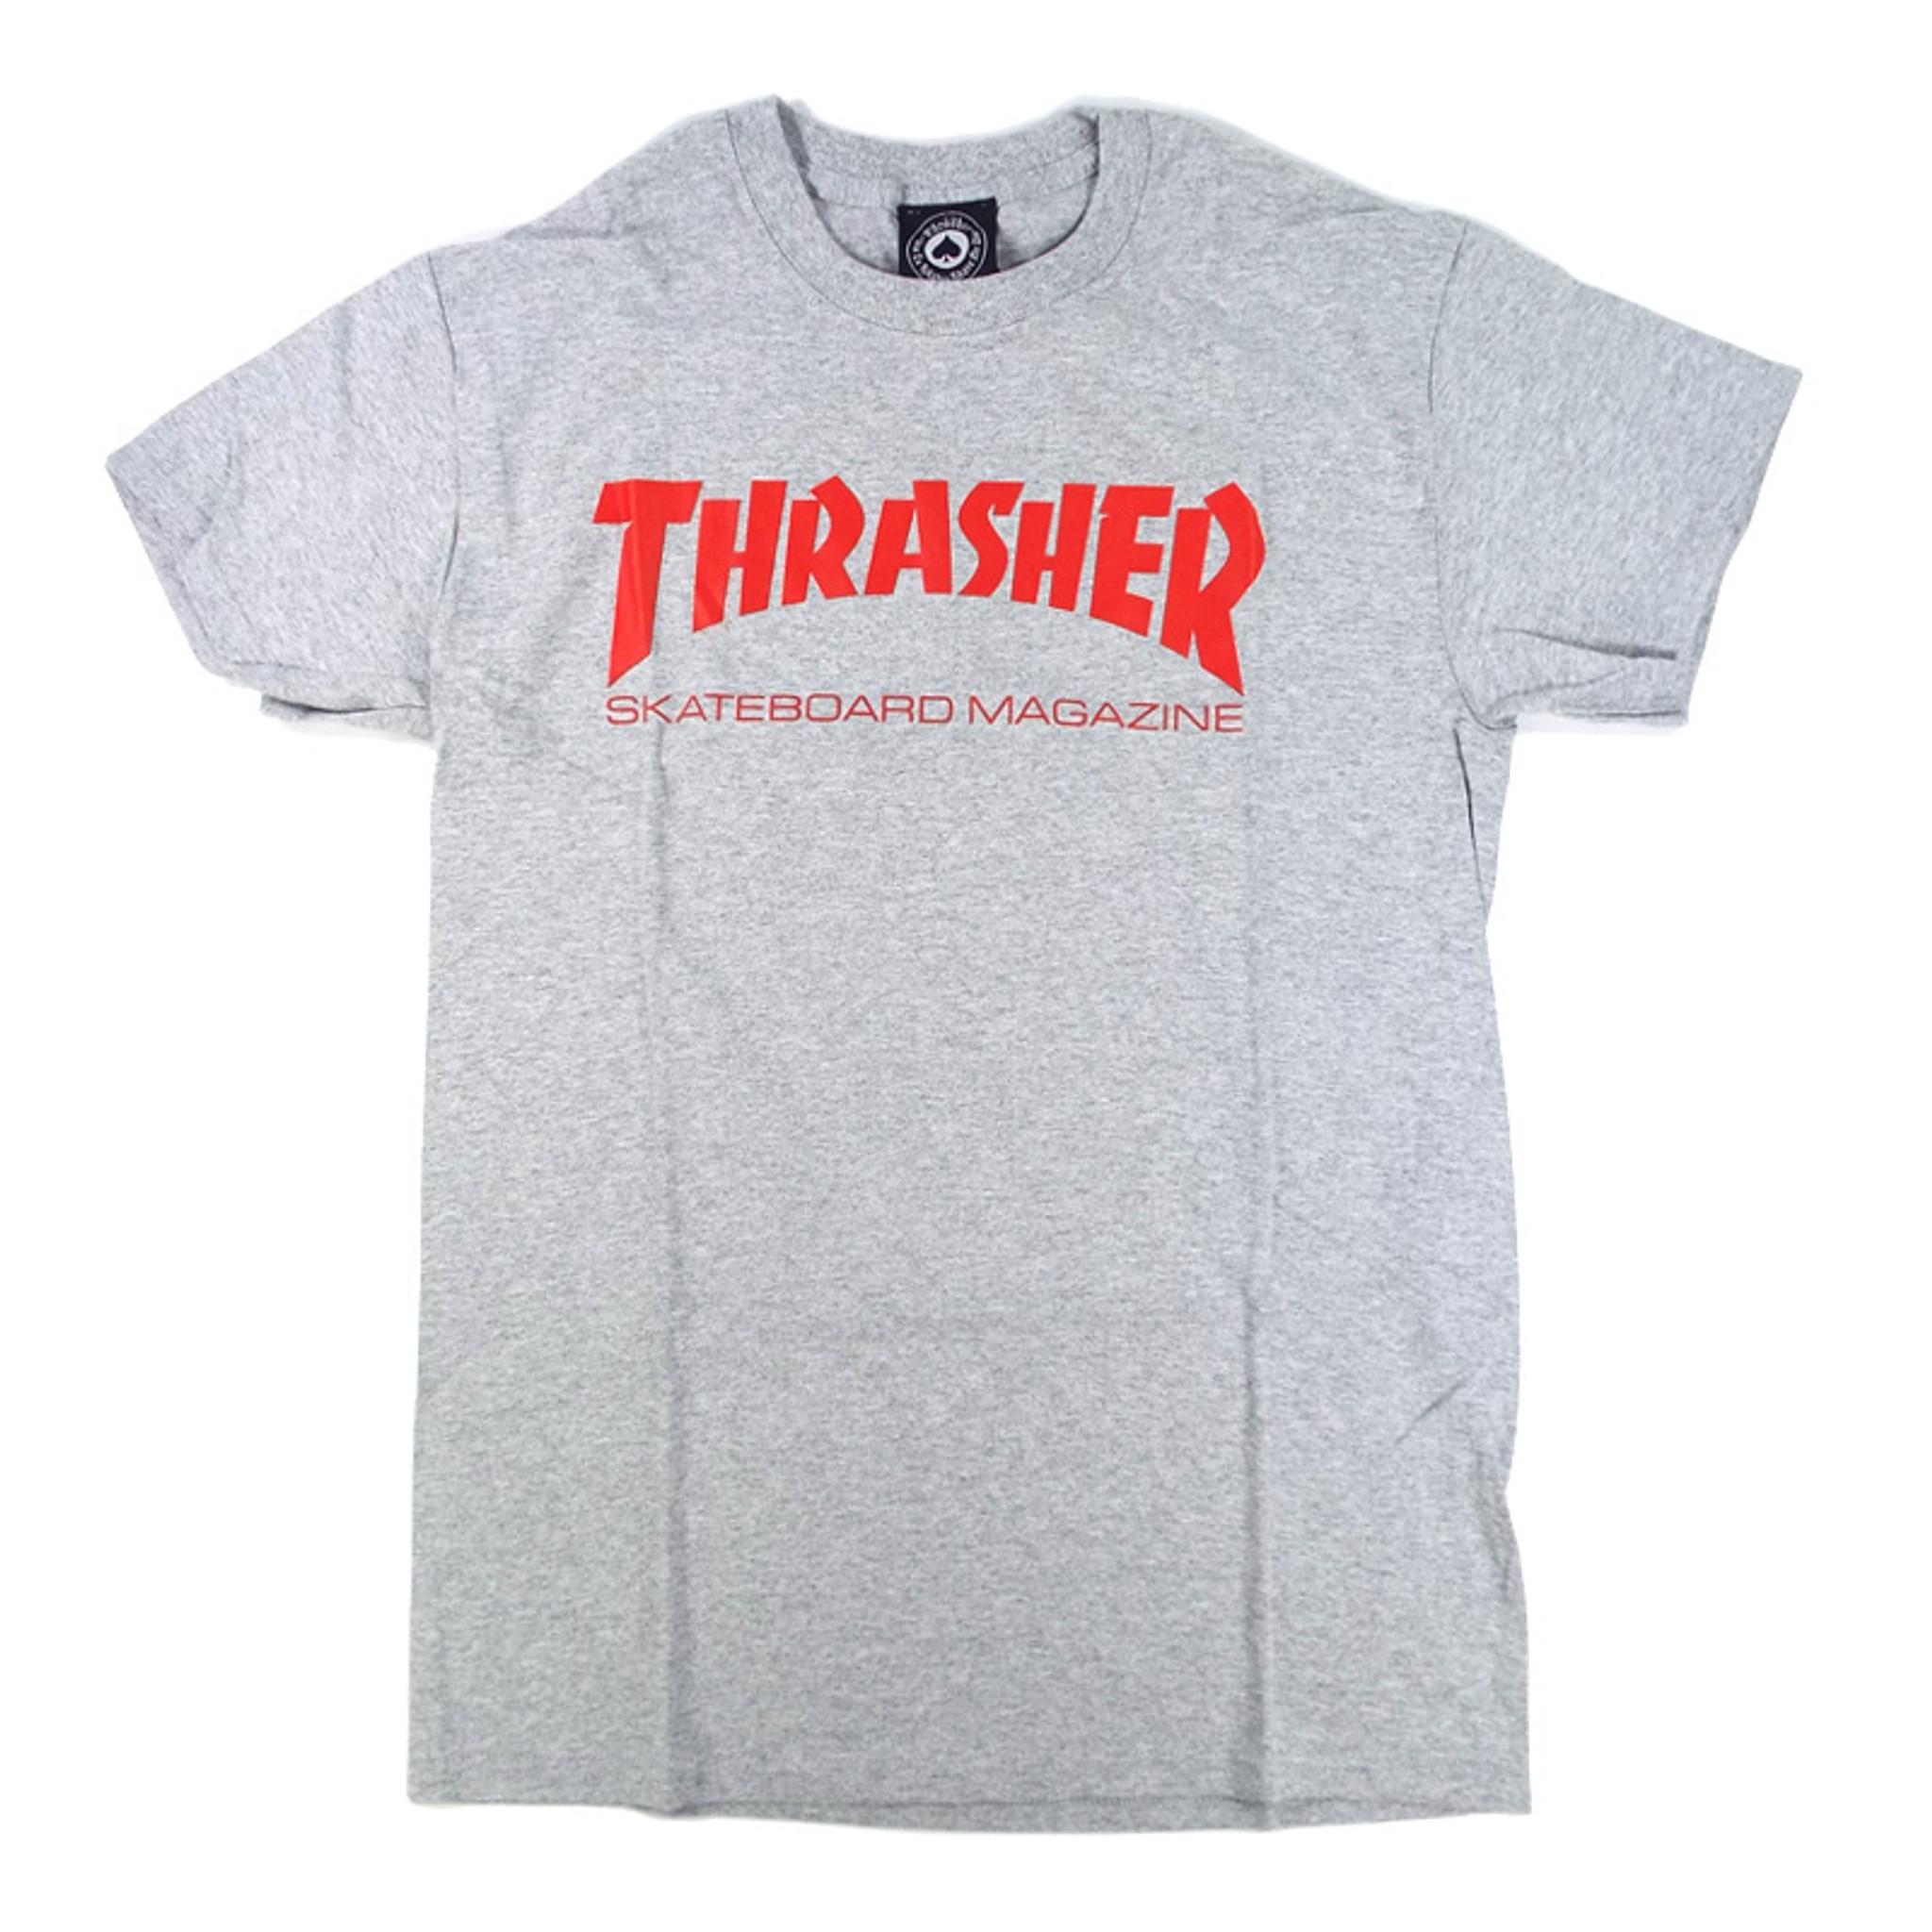 2c0b43695b94 Thrasher Skate Mag T-Shirt - Heather Grey/Red - Detroit City ...